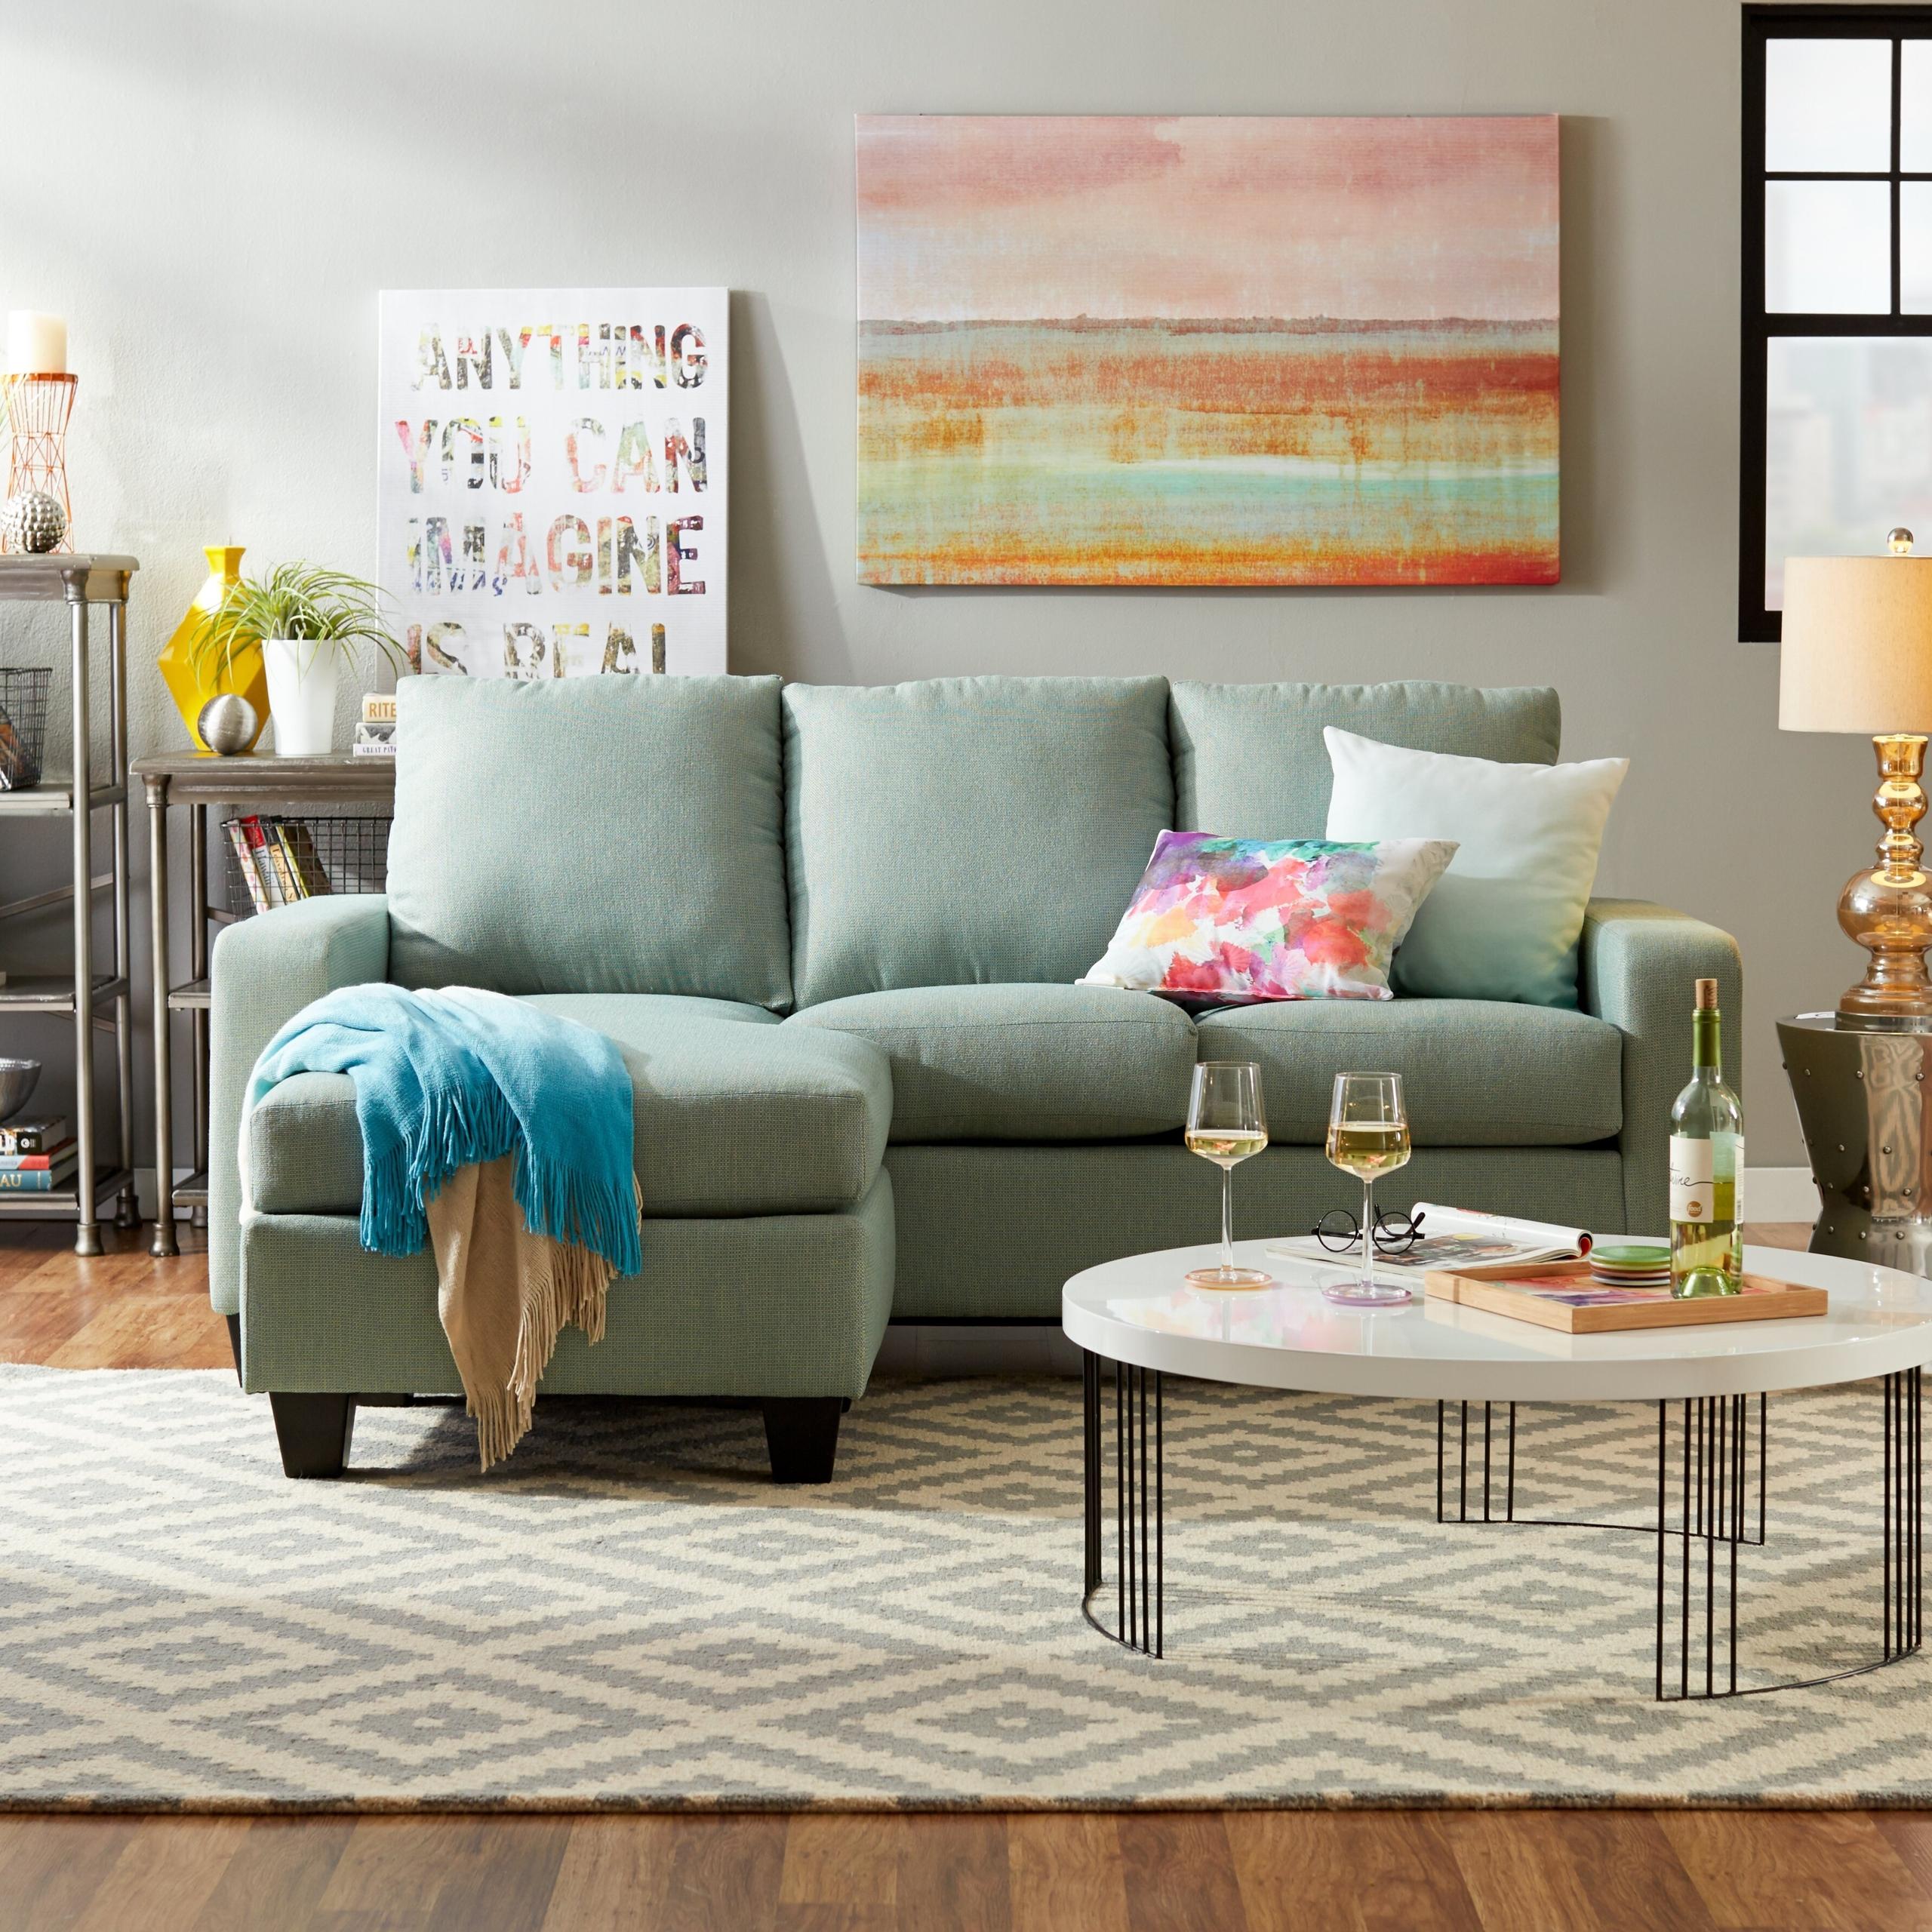 Hardwood Reversible Sectional Sofa With Ottoman